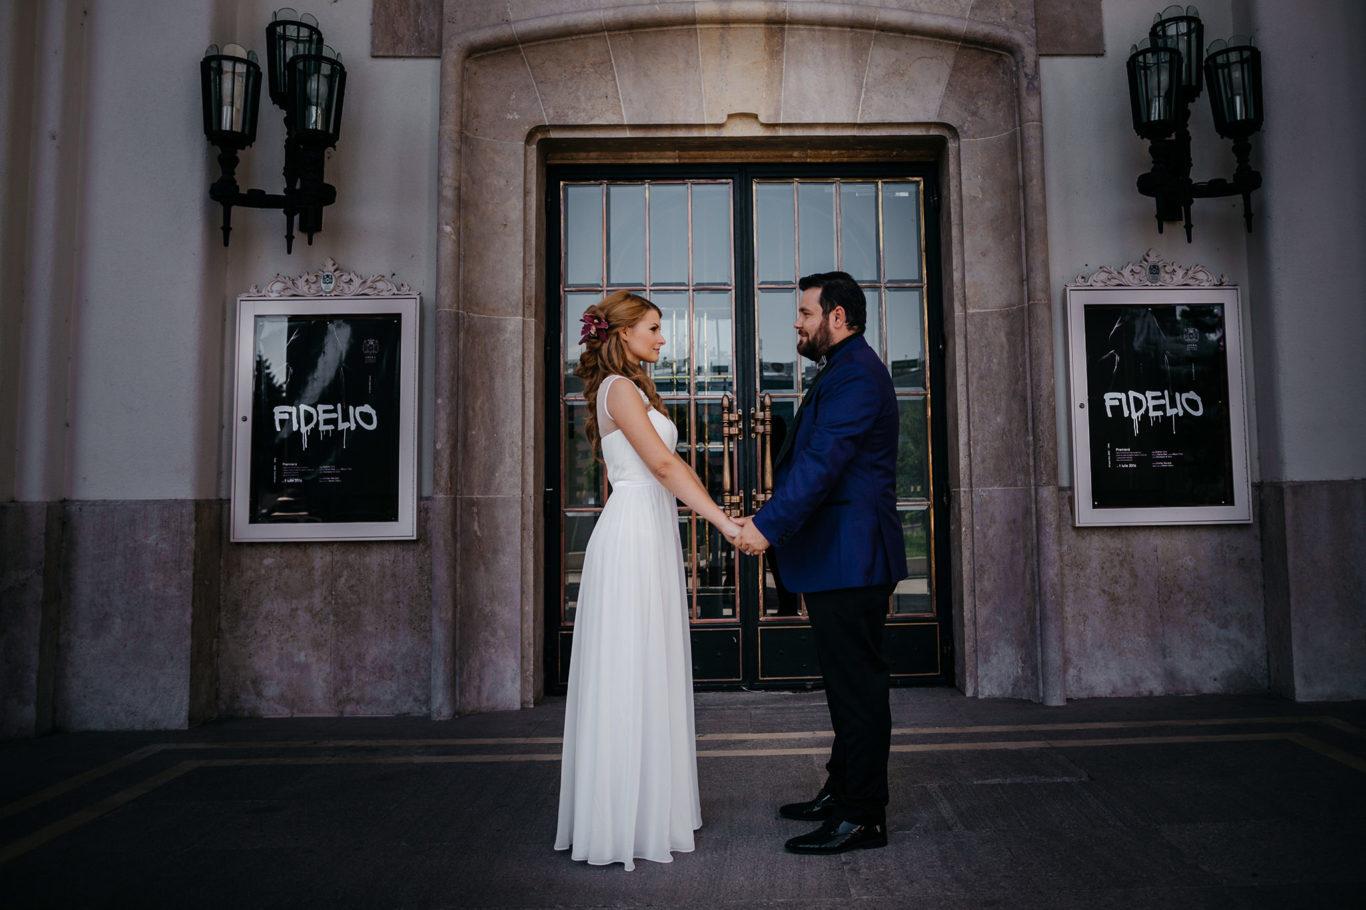 0155-fotografie-nunta-bucuresti-rodica-rares-fotograf-ciprian-dumitrescu-dc1_0024